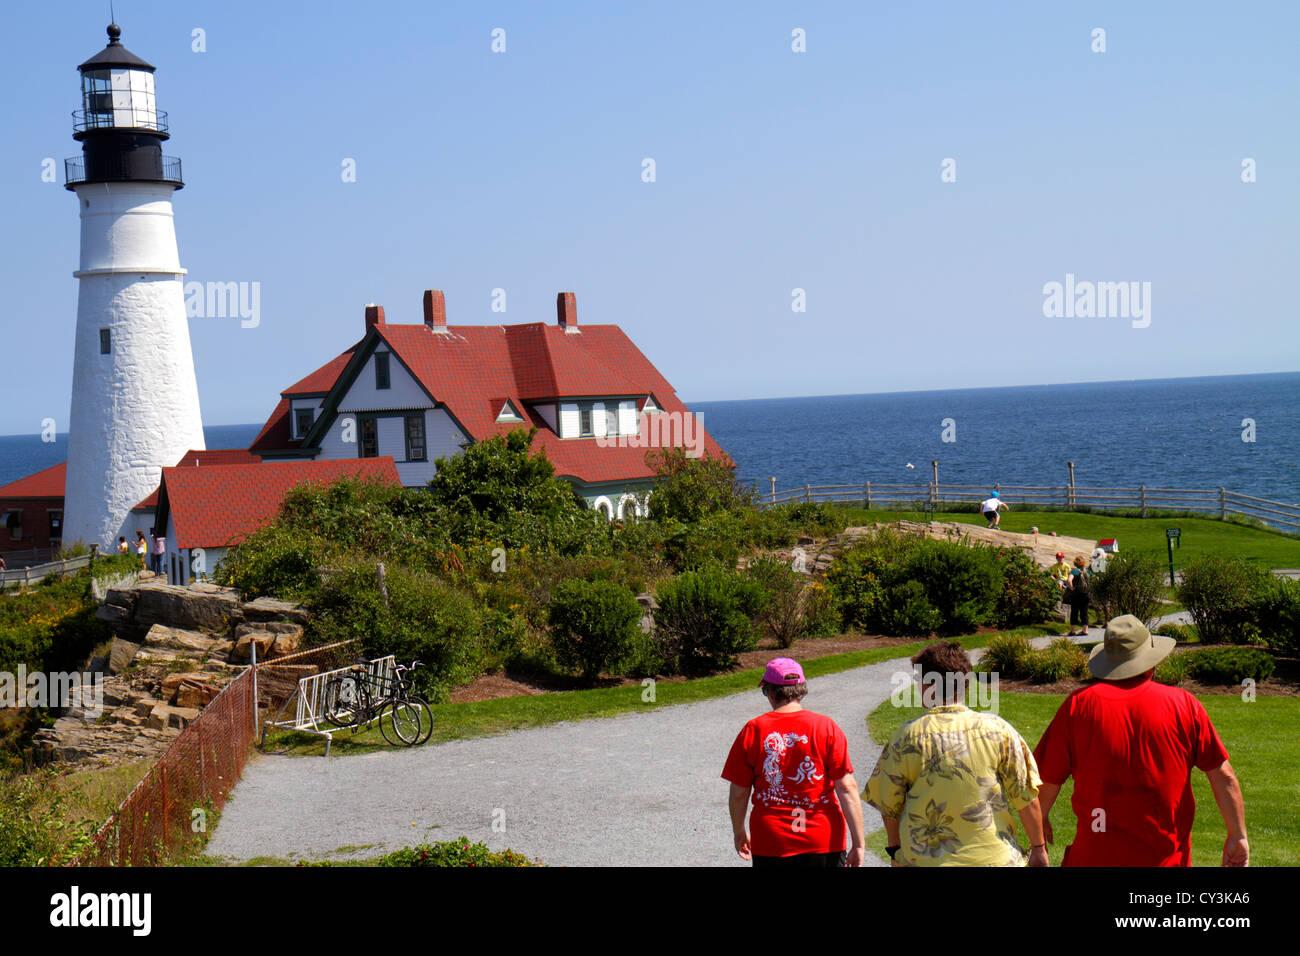 Portland Maine Cape Elizabeth Portland Head Light lighthouse